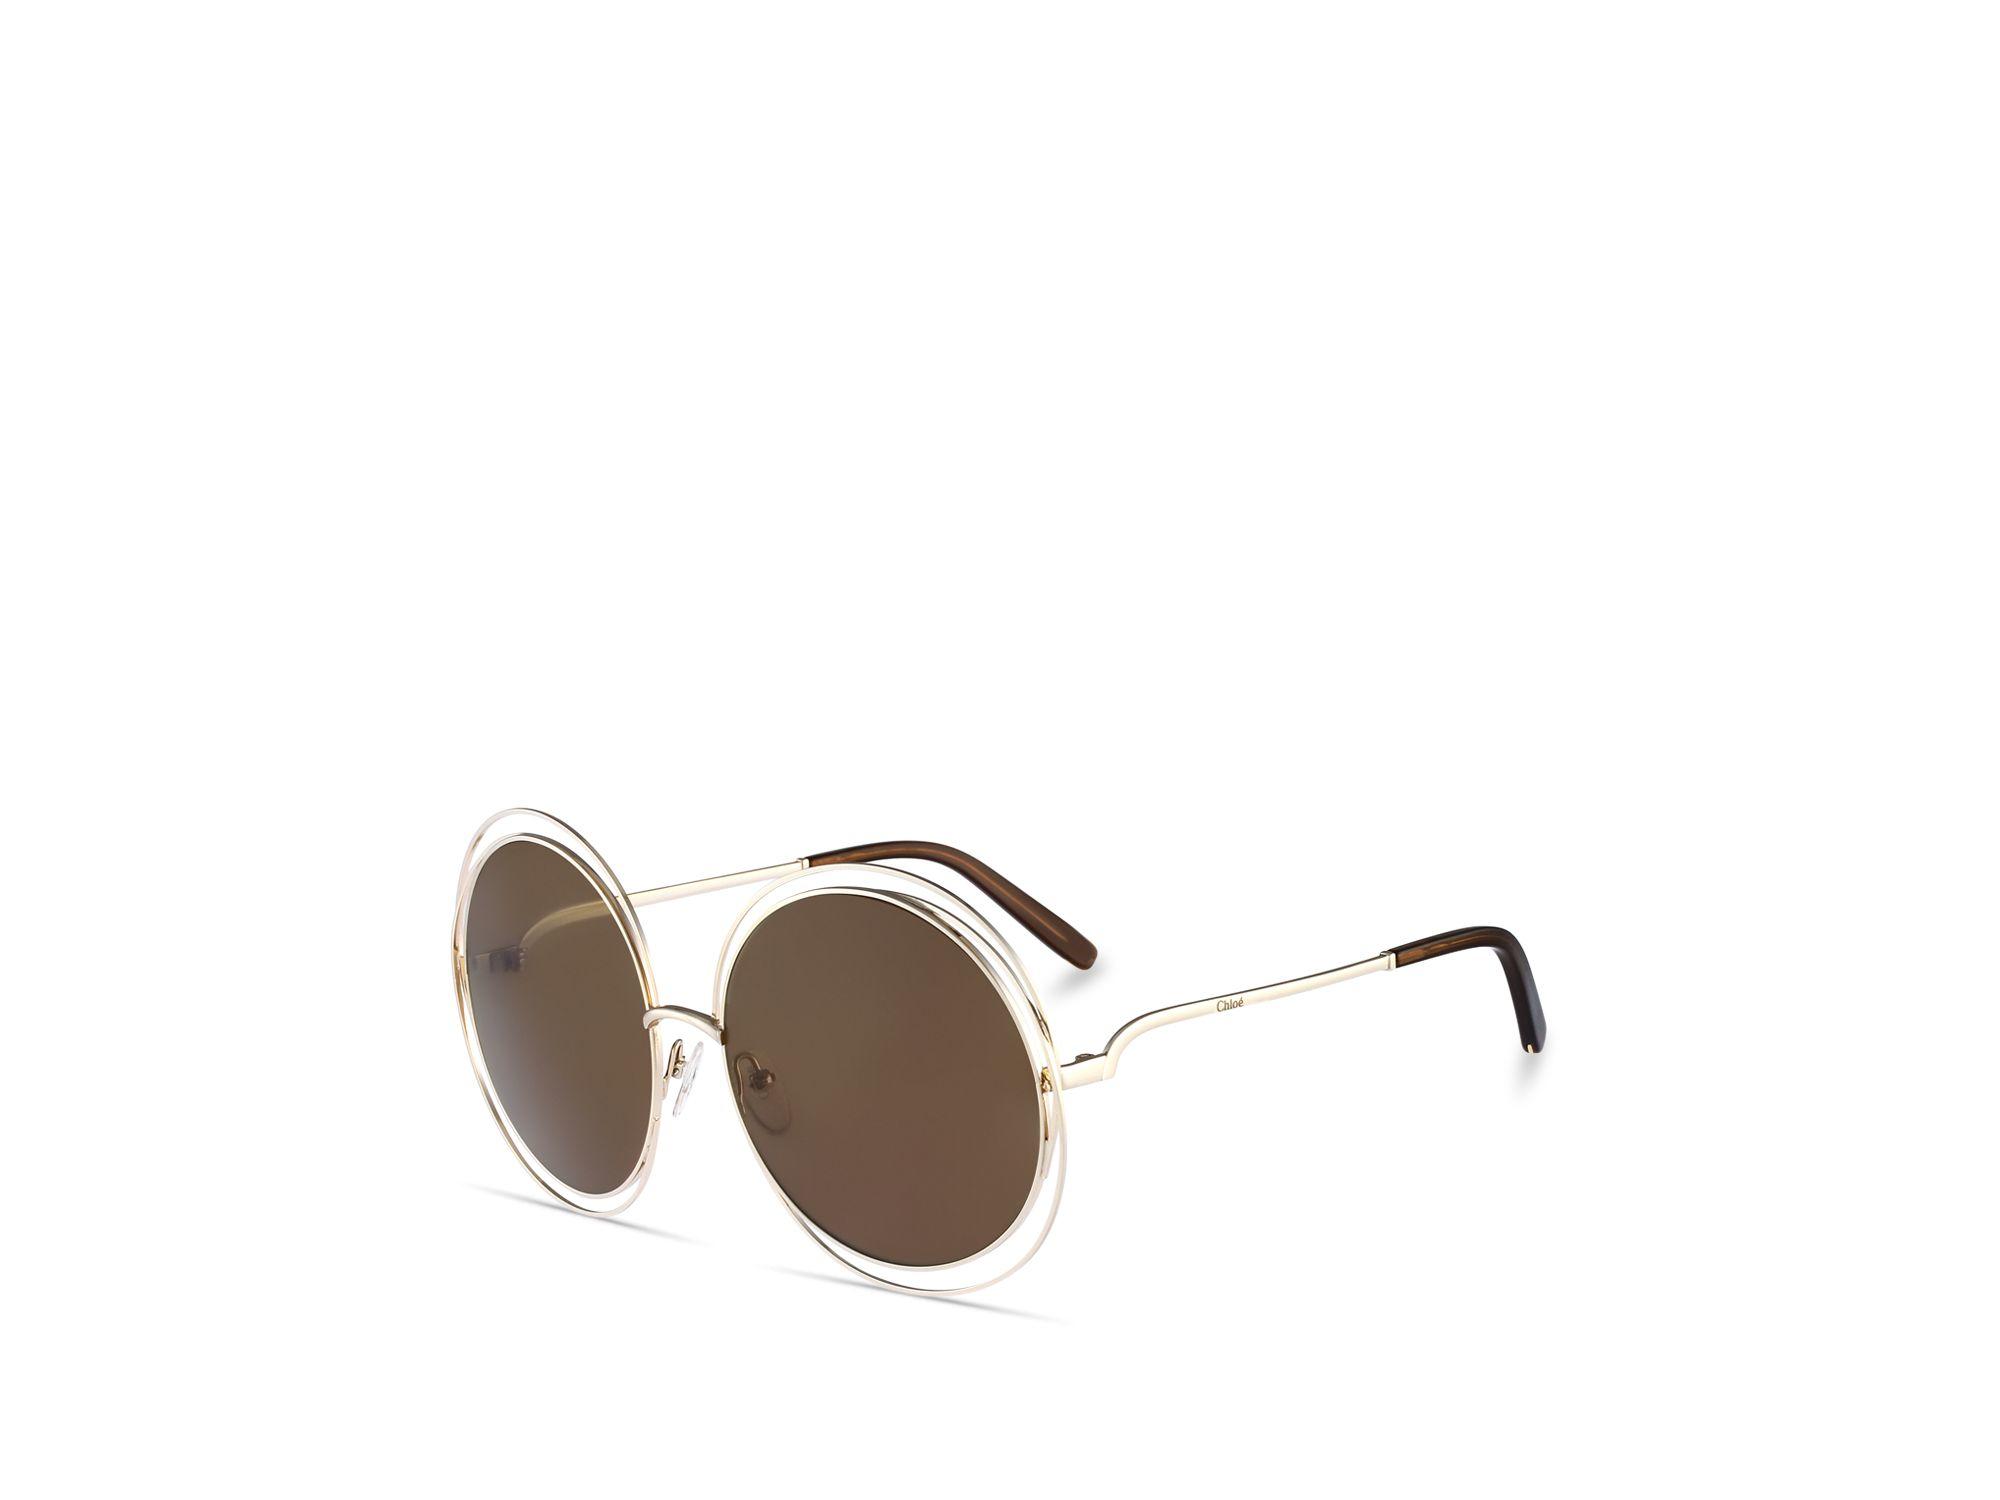 ed77ca202e8f Chloe Oversized Round Sunglasses « Heritage Malta